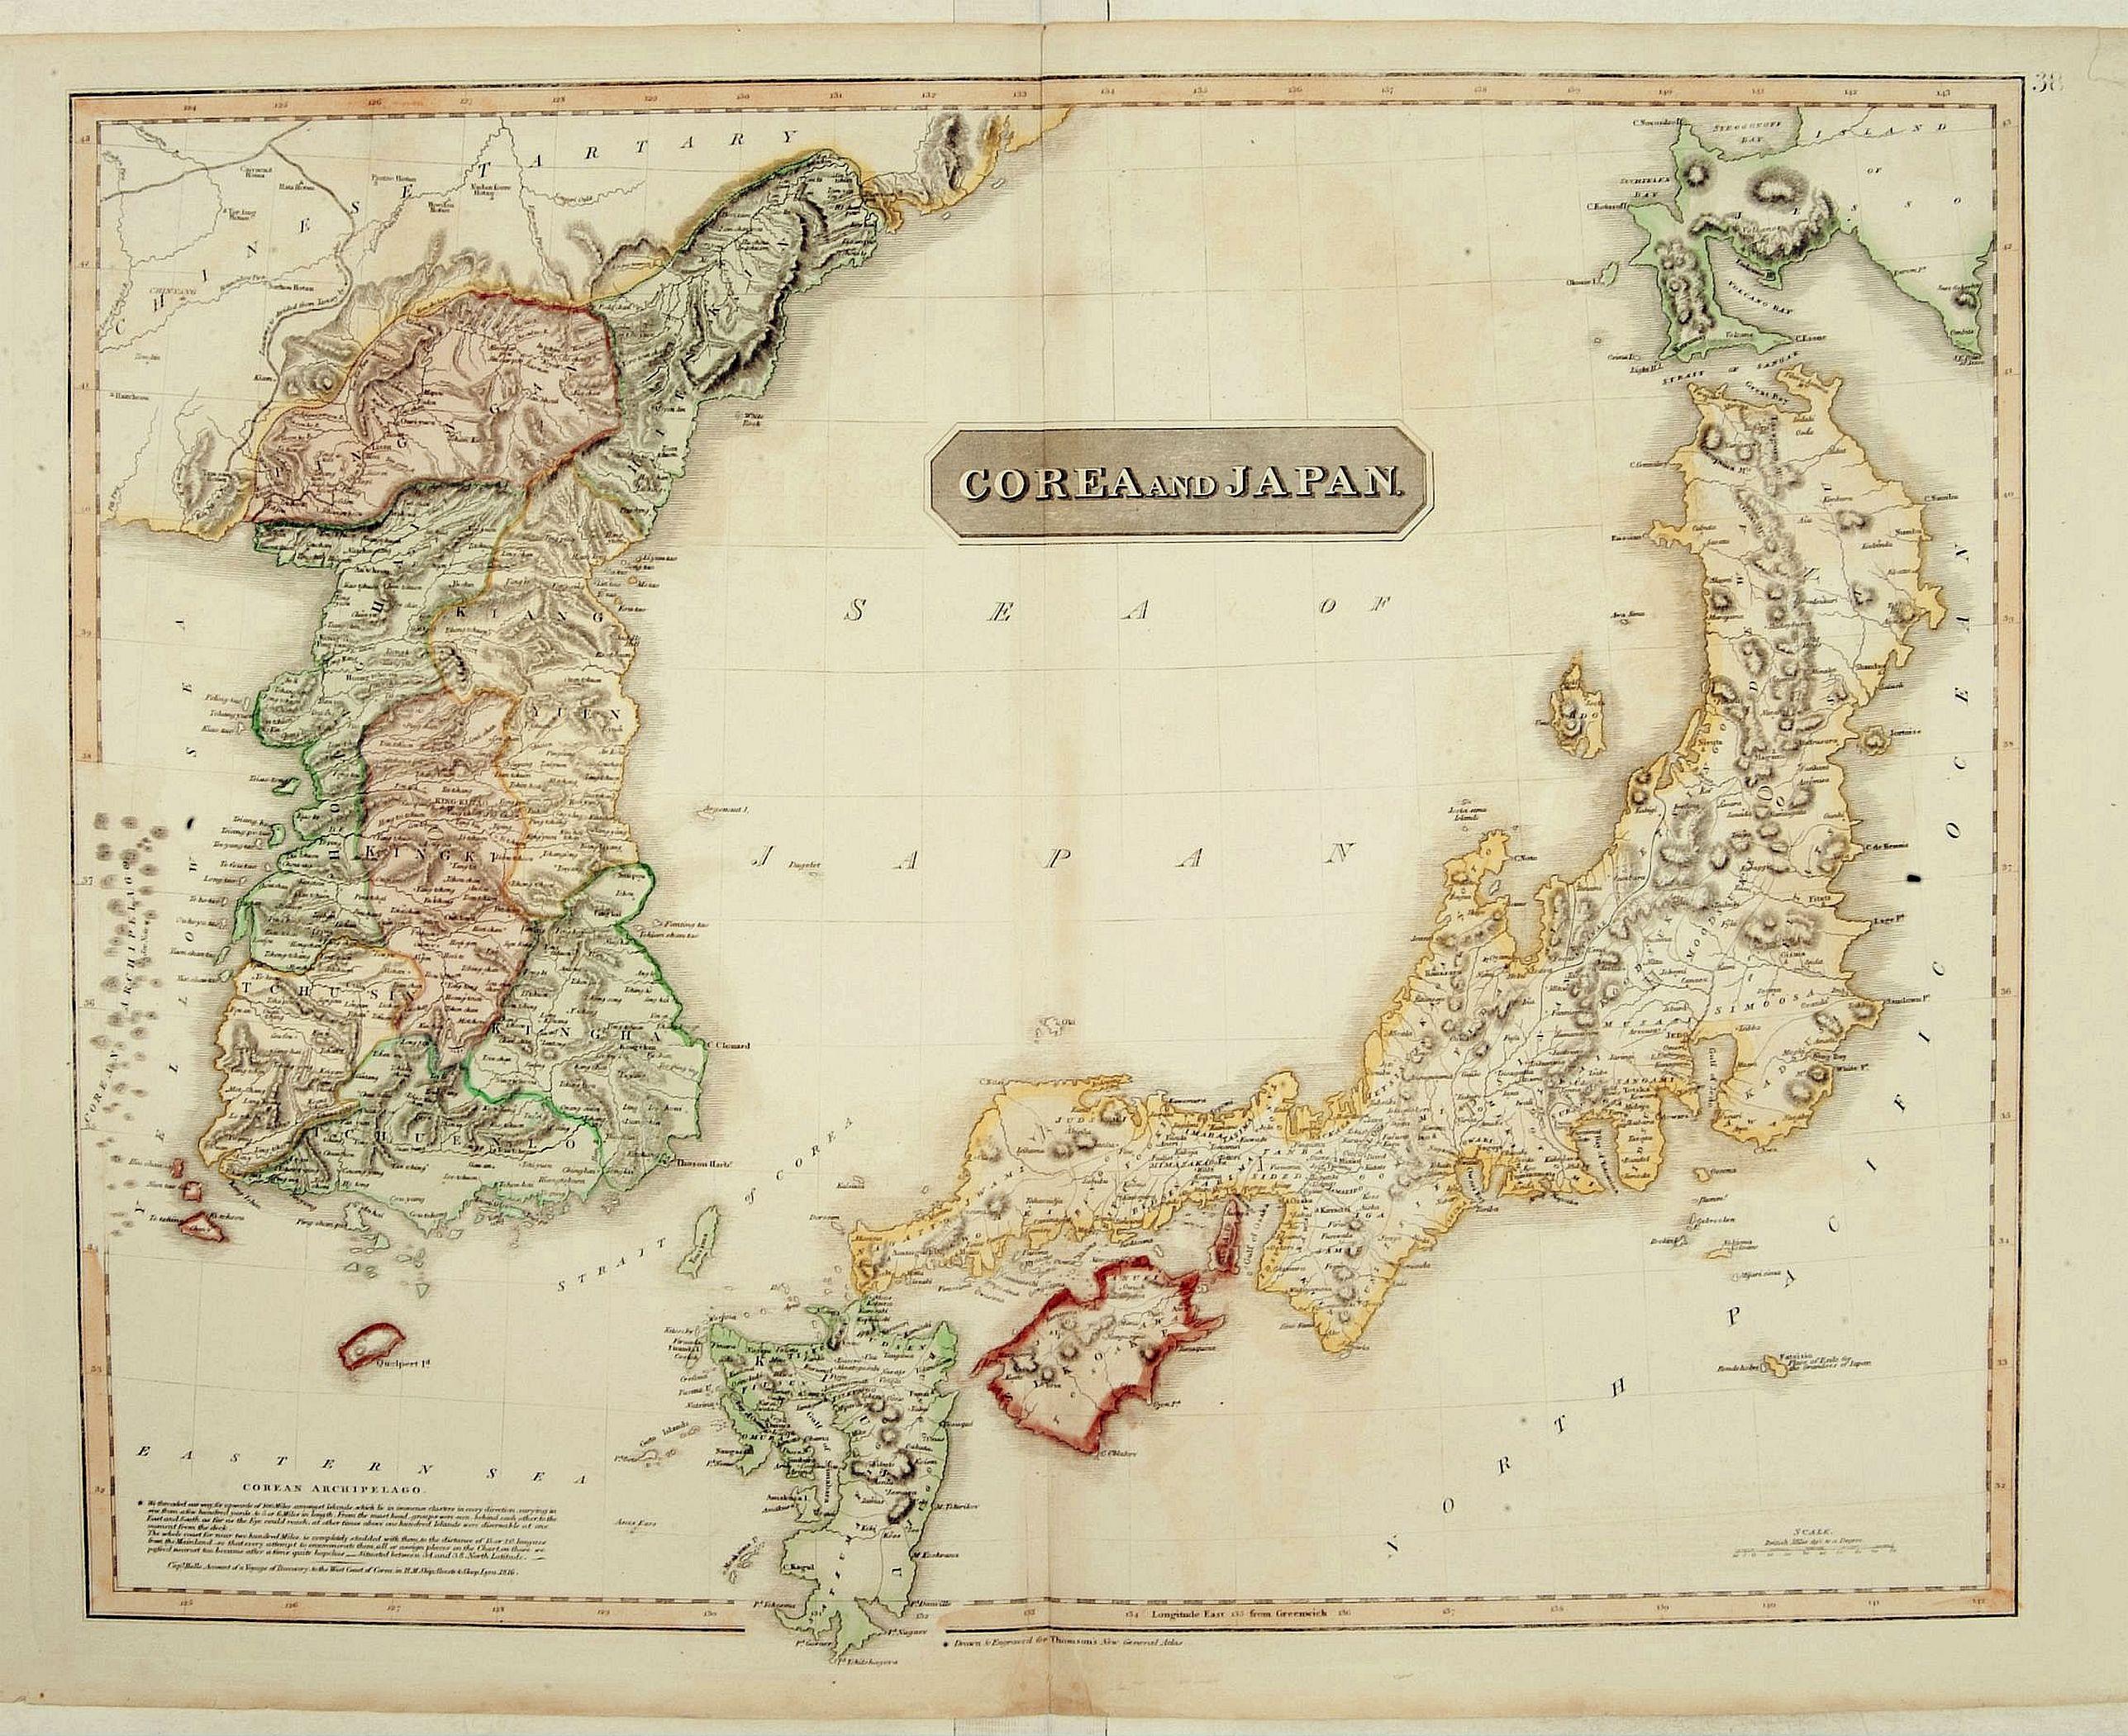 THOMSON, J. -  Corea and Japan.